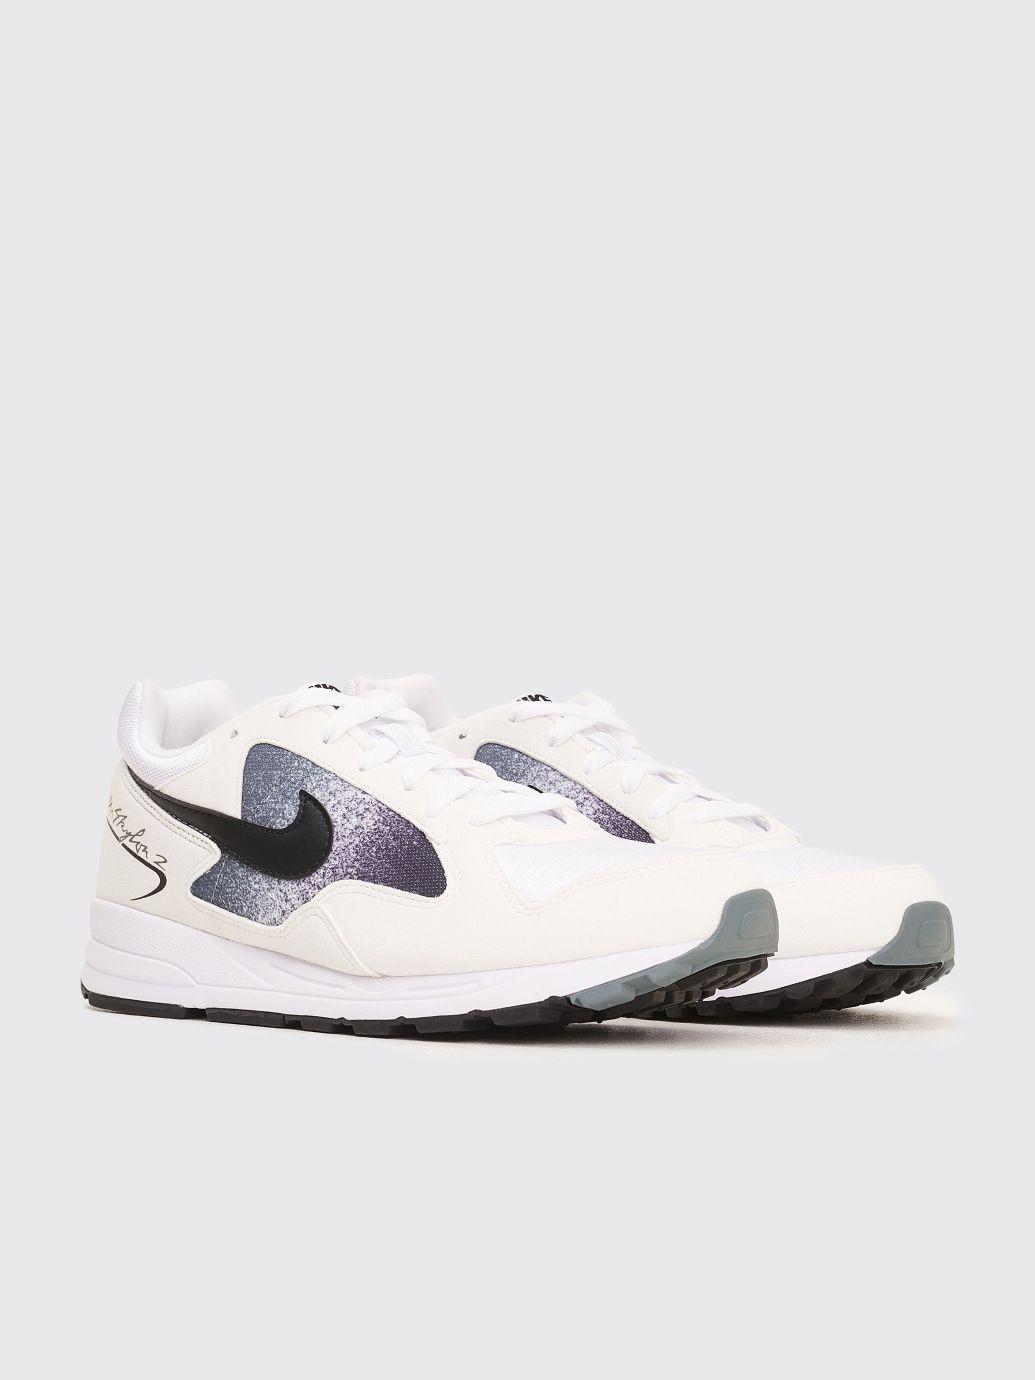 buy popular a5b07 d0930 Très Bien - Nike Sportswear Air Skylon II White   Black   Cool Grey